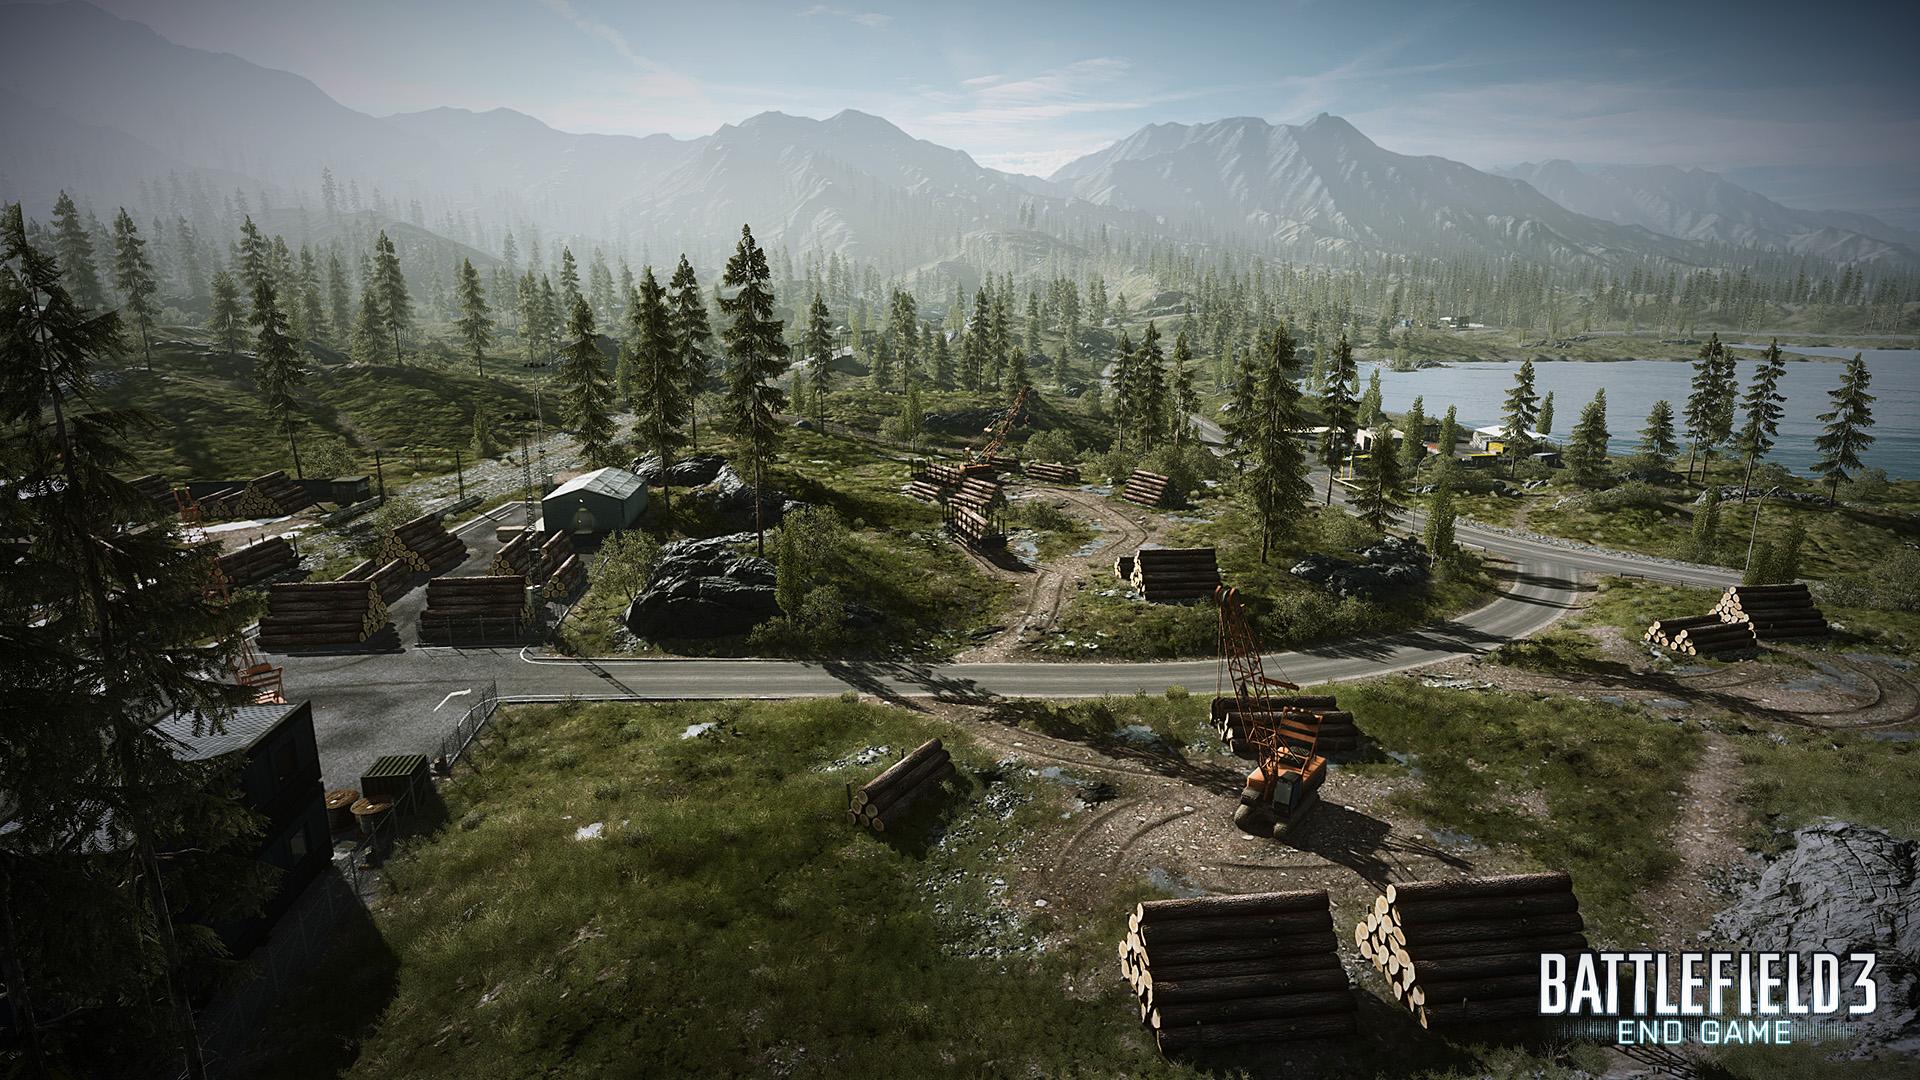 Battlefield 3 : End Game / Capture the flag 75535